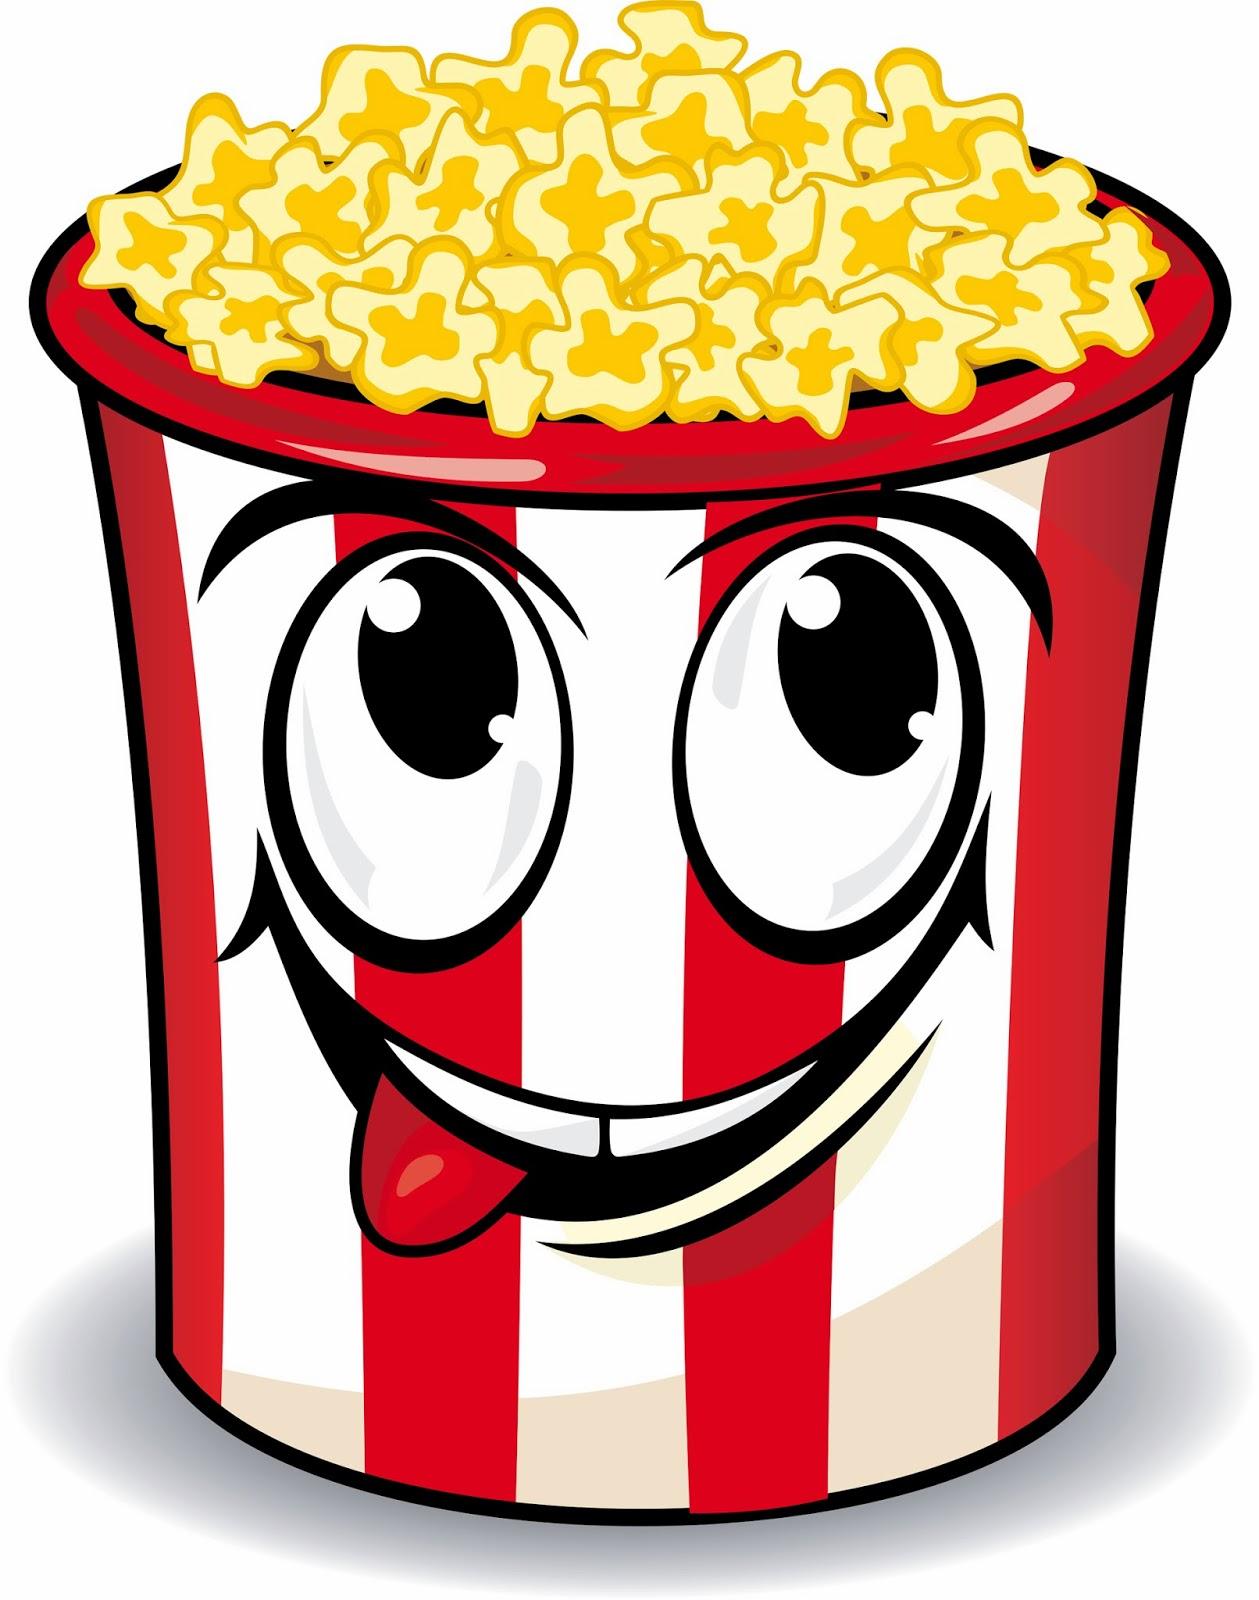 1259x1600 Clipart Of Popcorn